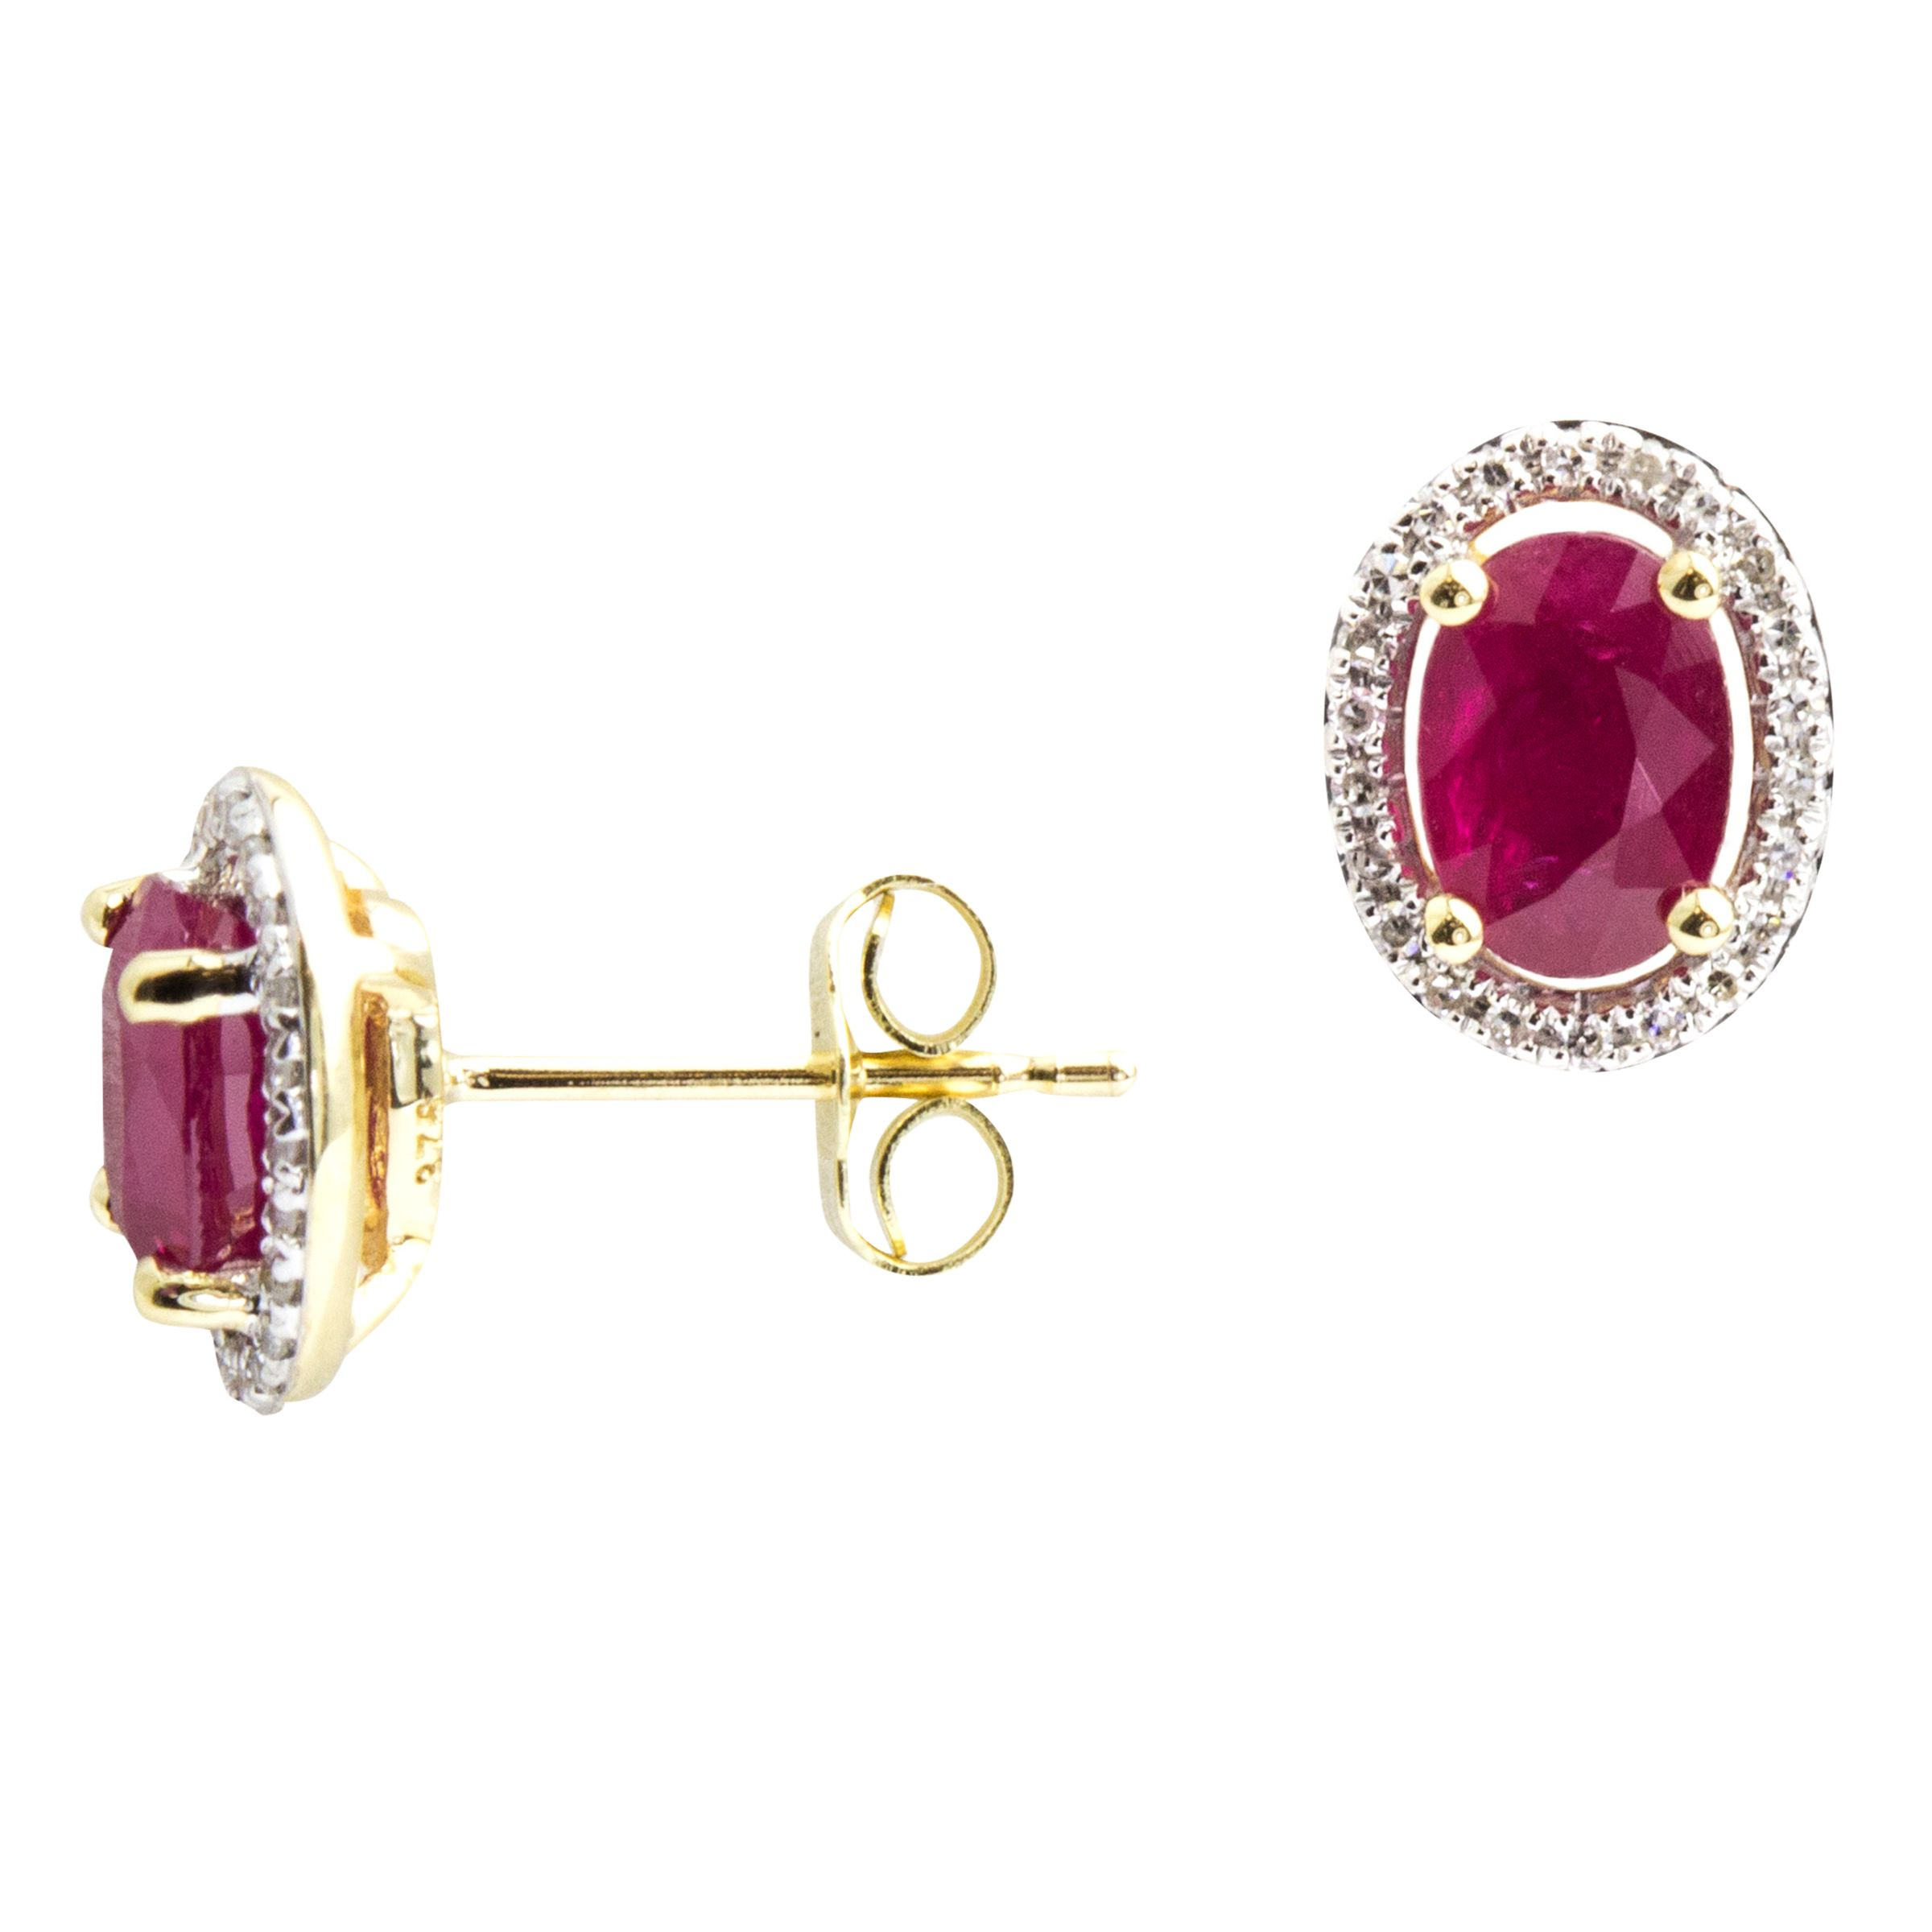 Ruby Wedding Gift Ideas John Lewis : Buy A B Davis 9ct Gold Oval Ruby Diamond Set Stud Earrings Online at ...